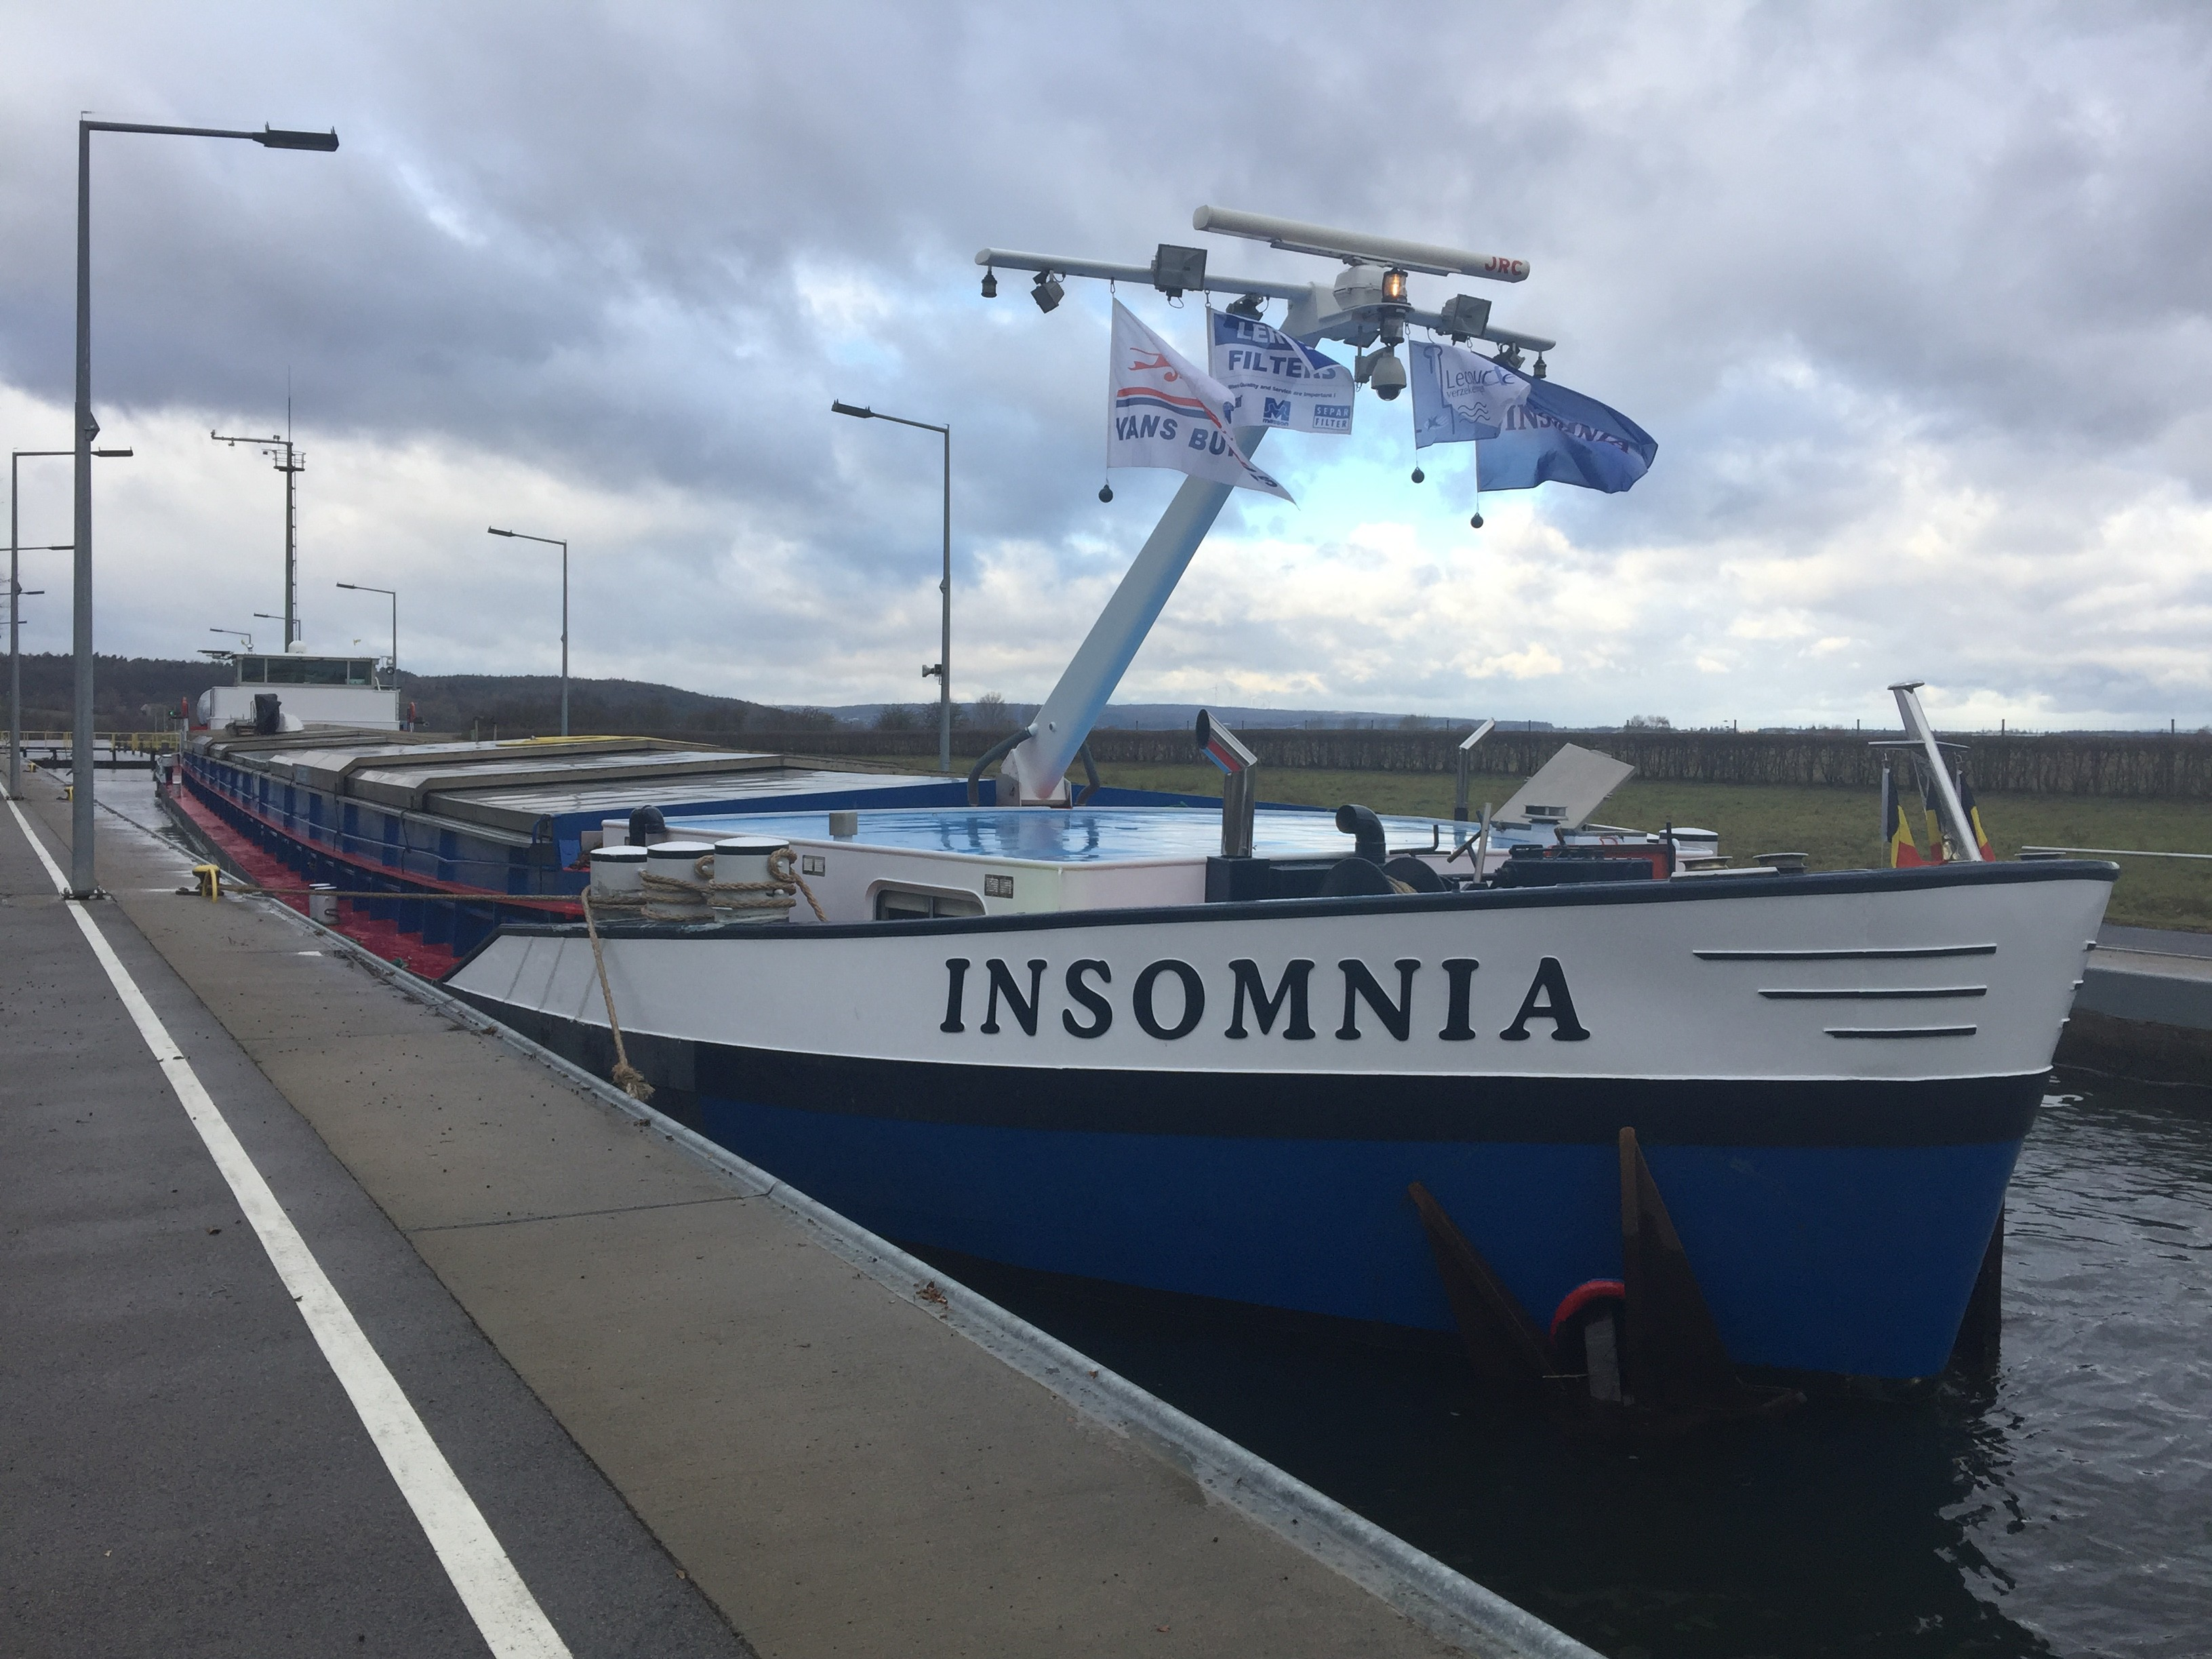 Insomnia Concordia Group